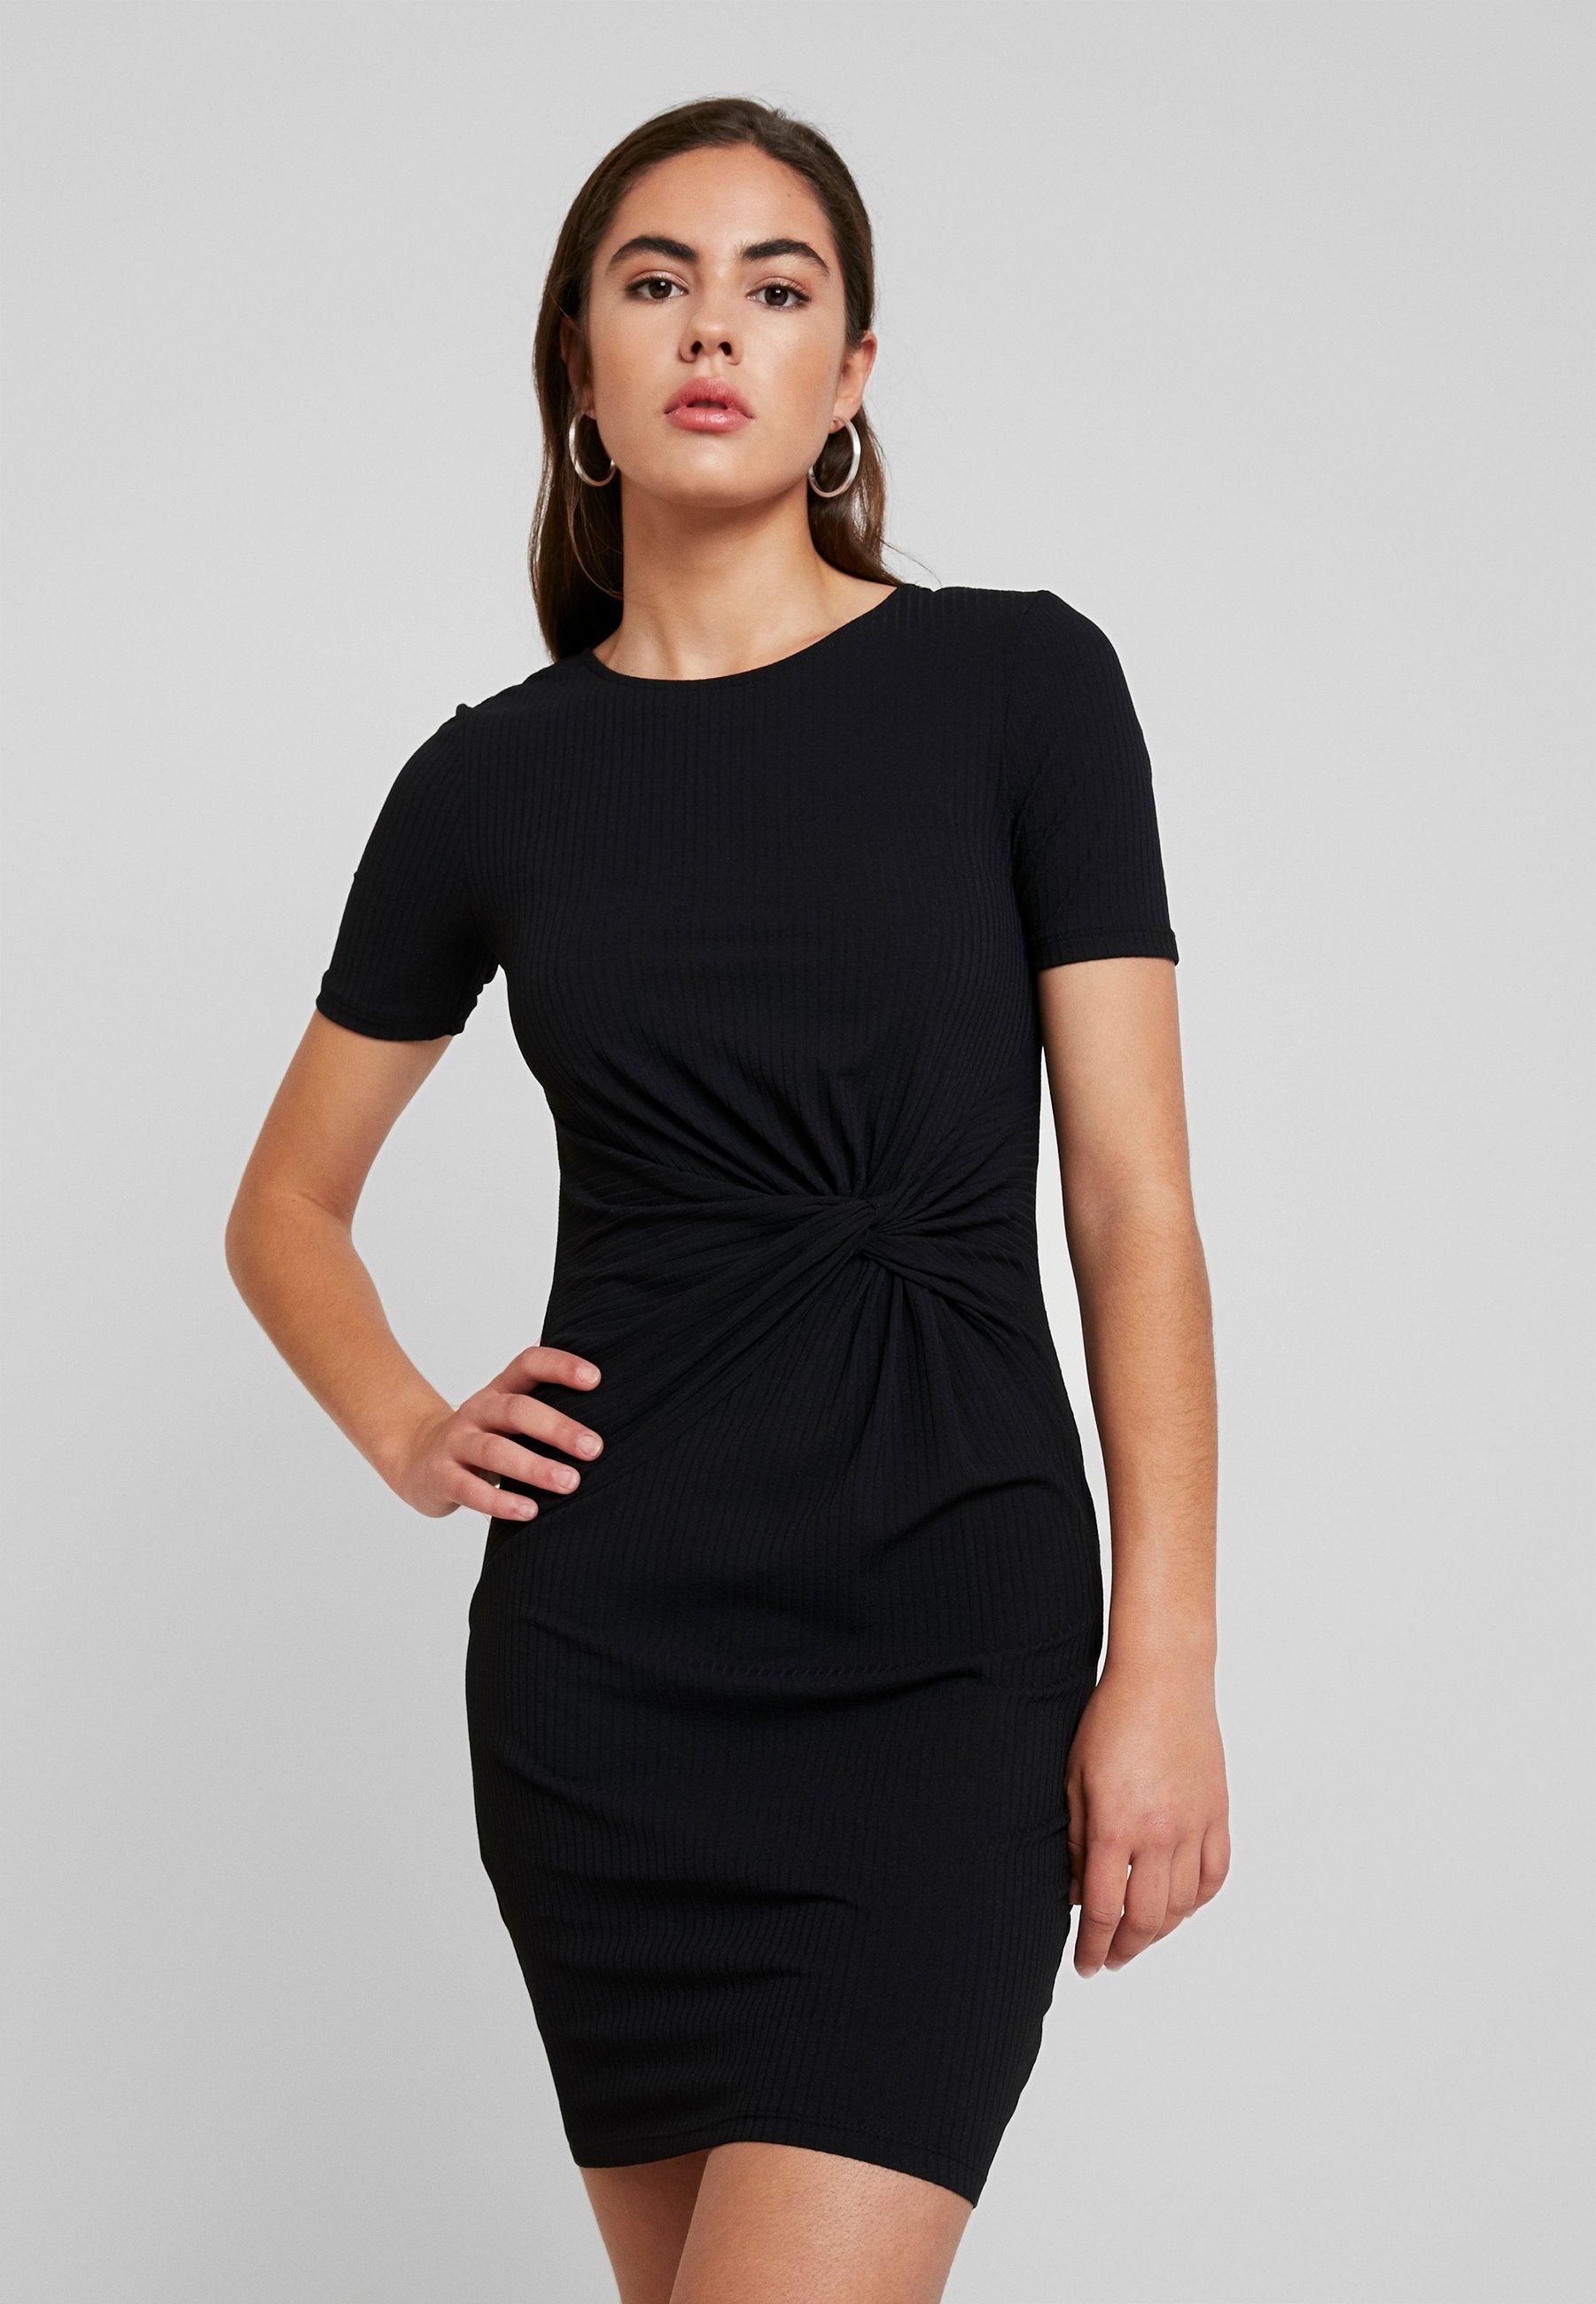 Pcmanula Fourreau DressRobe Black Pieces Pieces shrdCtQ